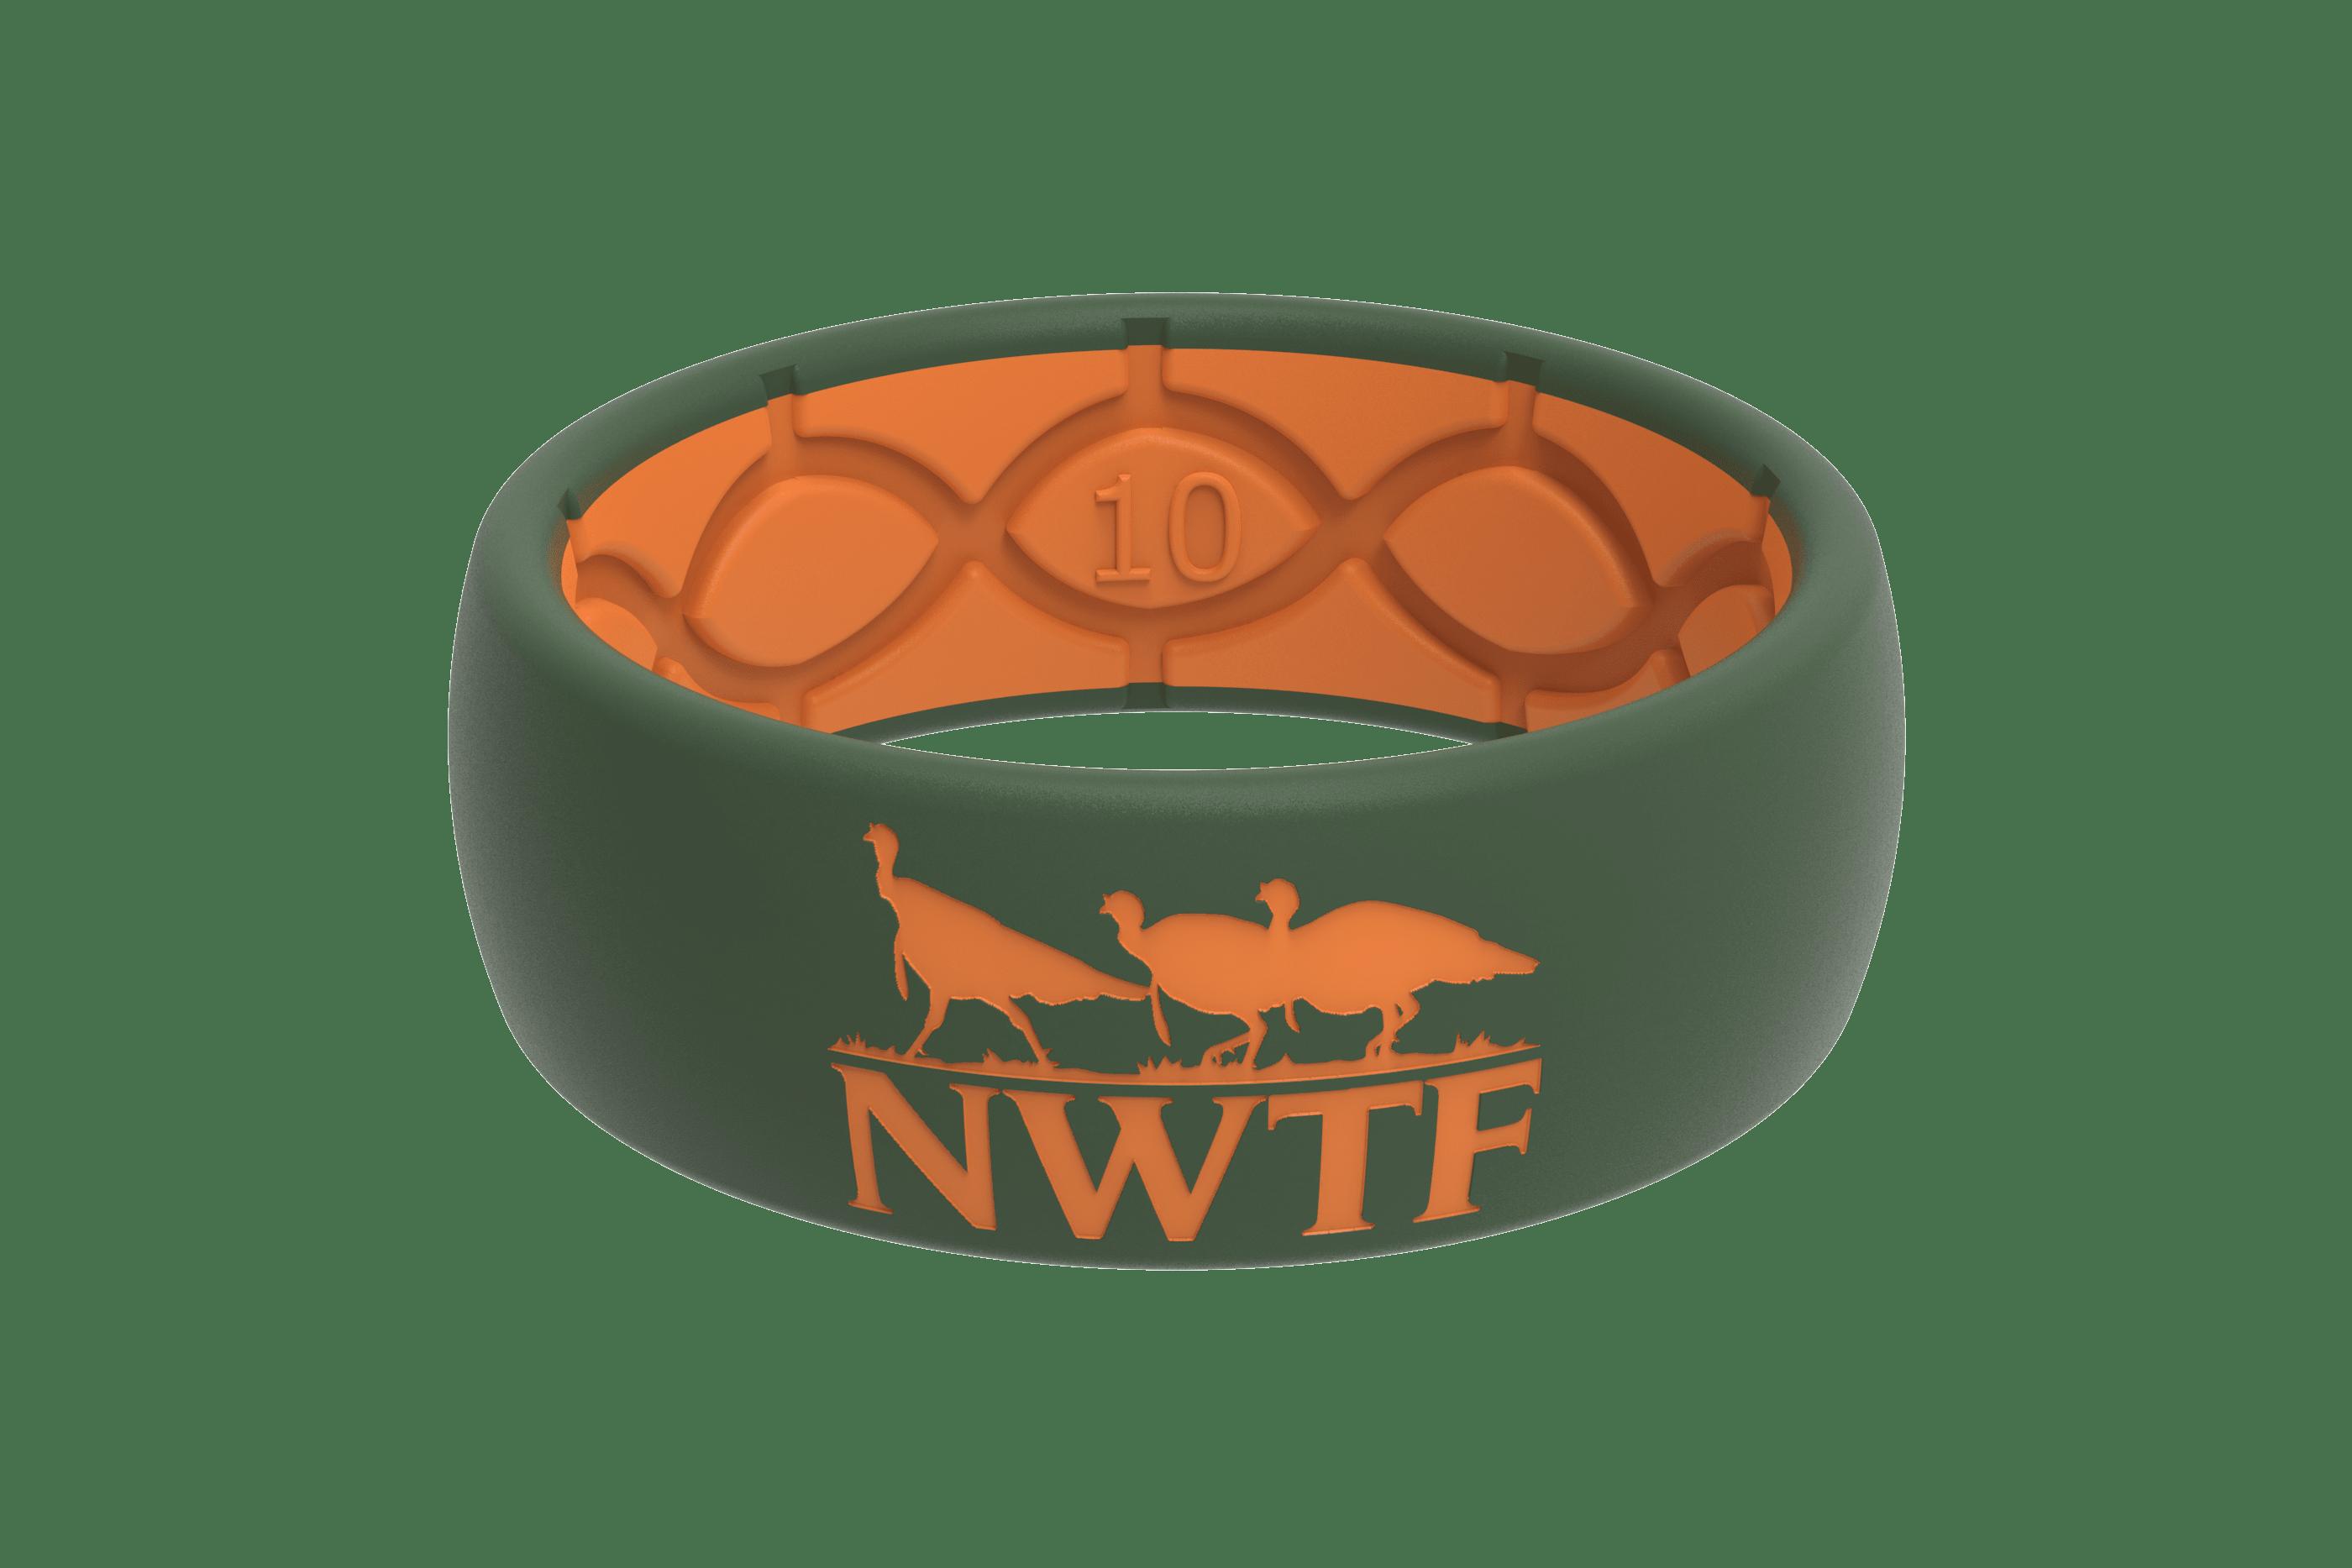 Original NWTF Moss Green Orange Logo  viewed front on